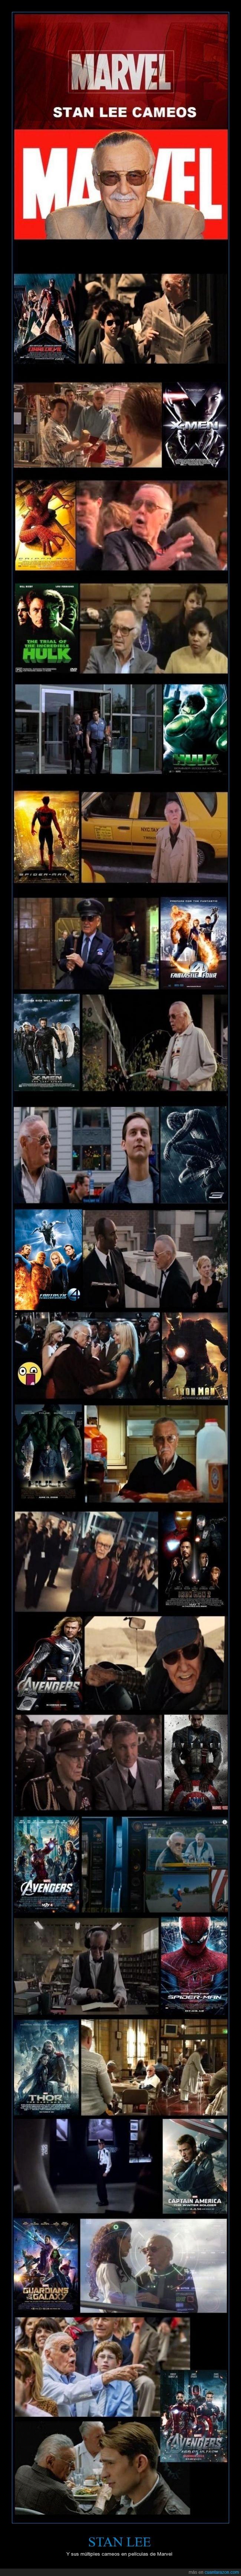 Avengers,Capitan America,Hulk,Iron Man,Marvel,Spiderman,Stan Lee,X-Men